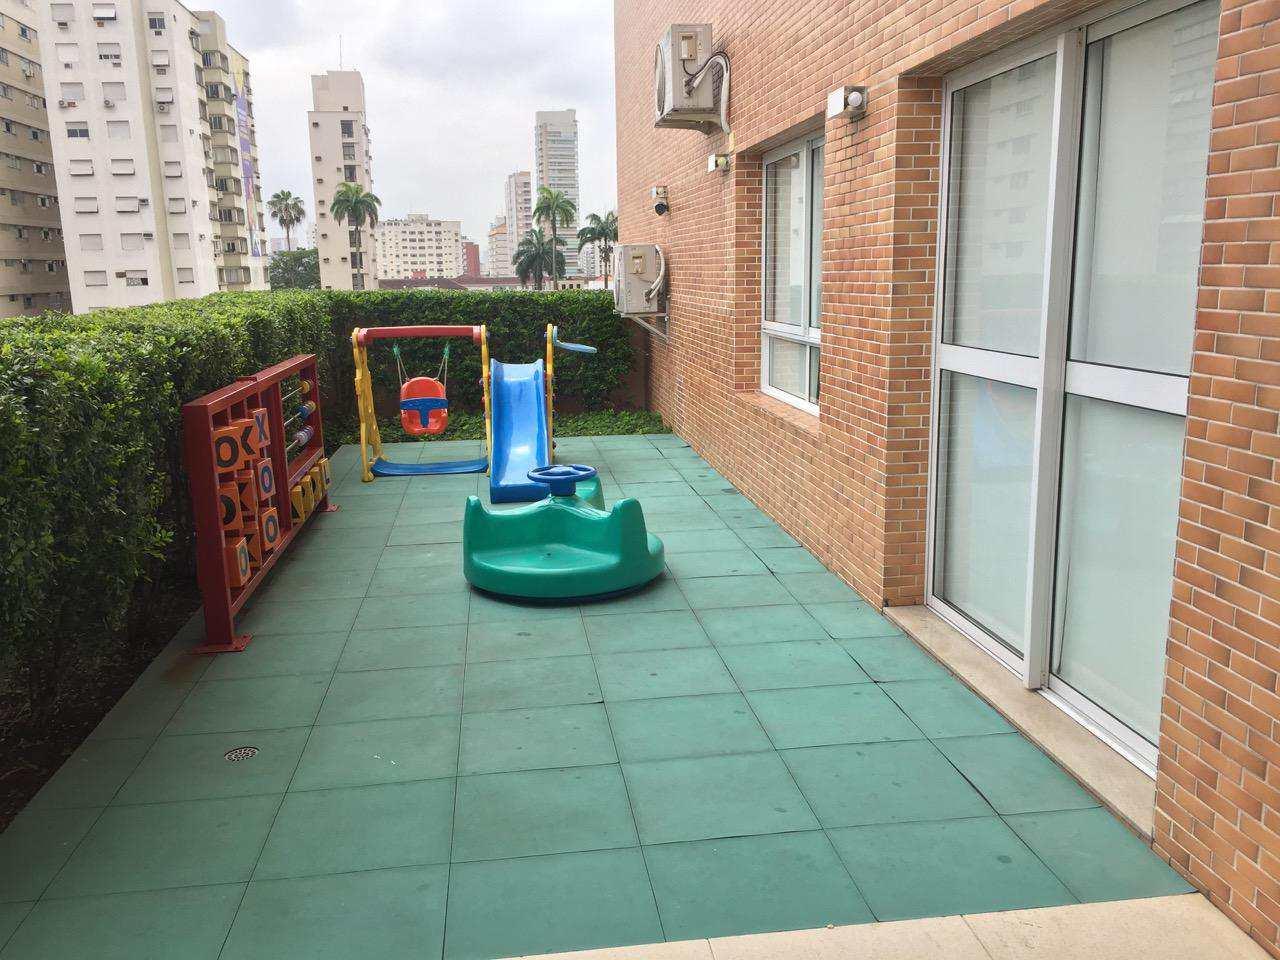 J - Areas de lazer do condominio  (4)